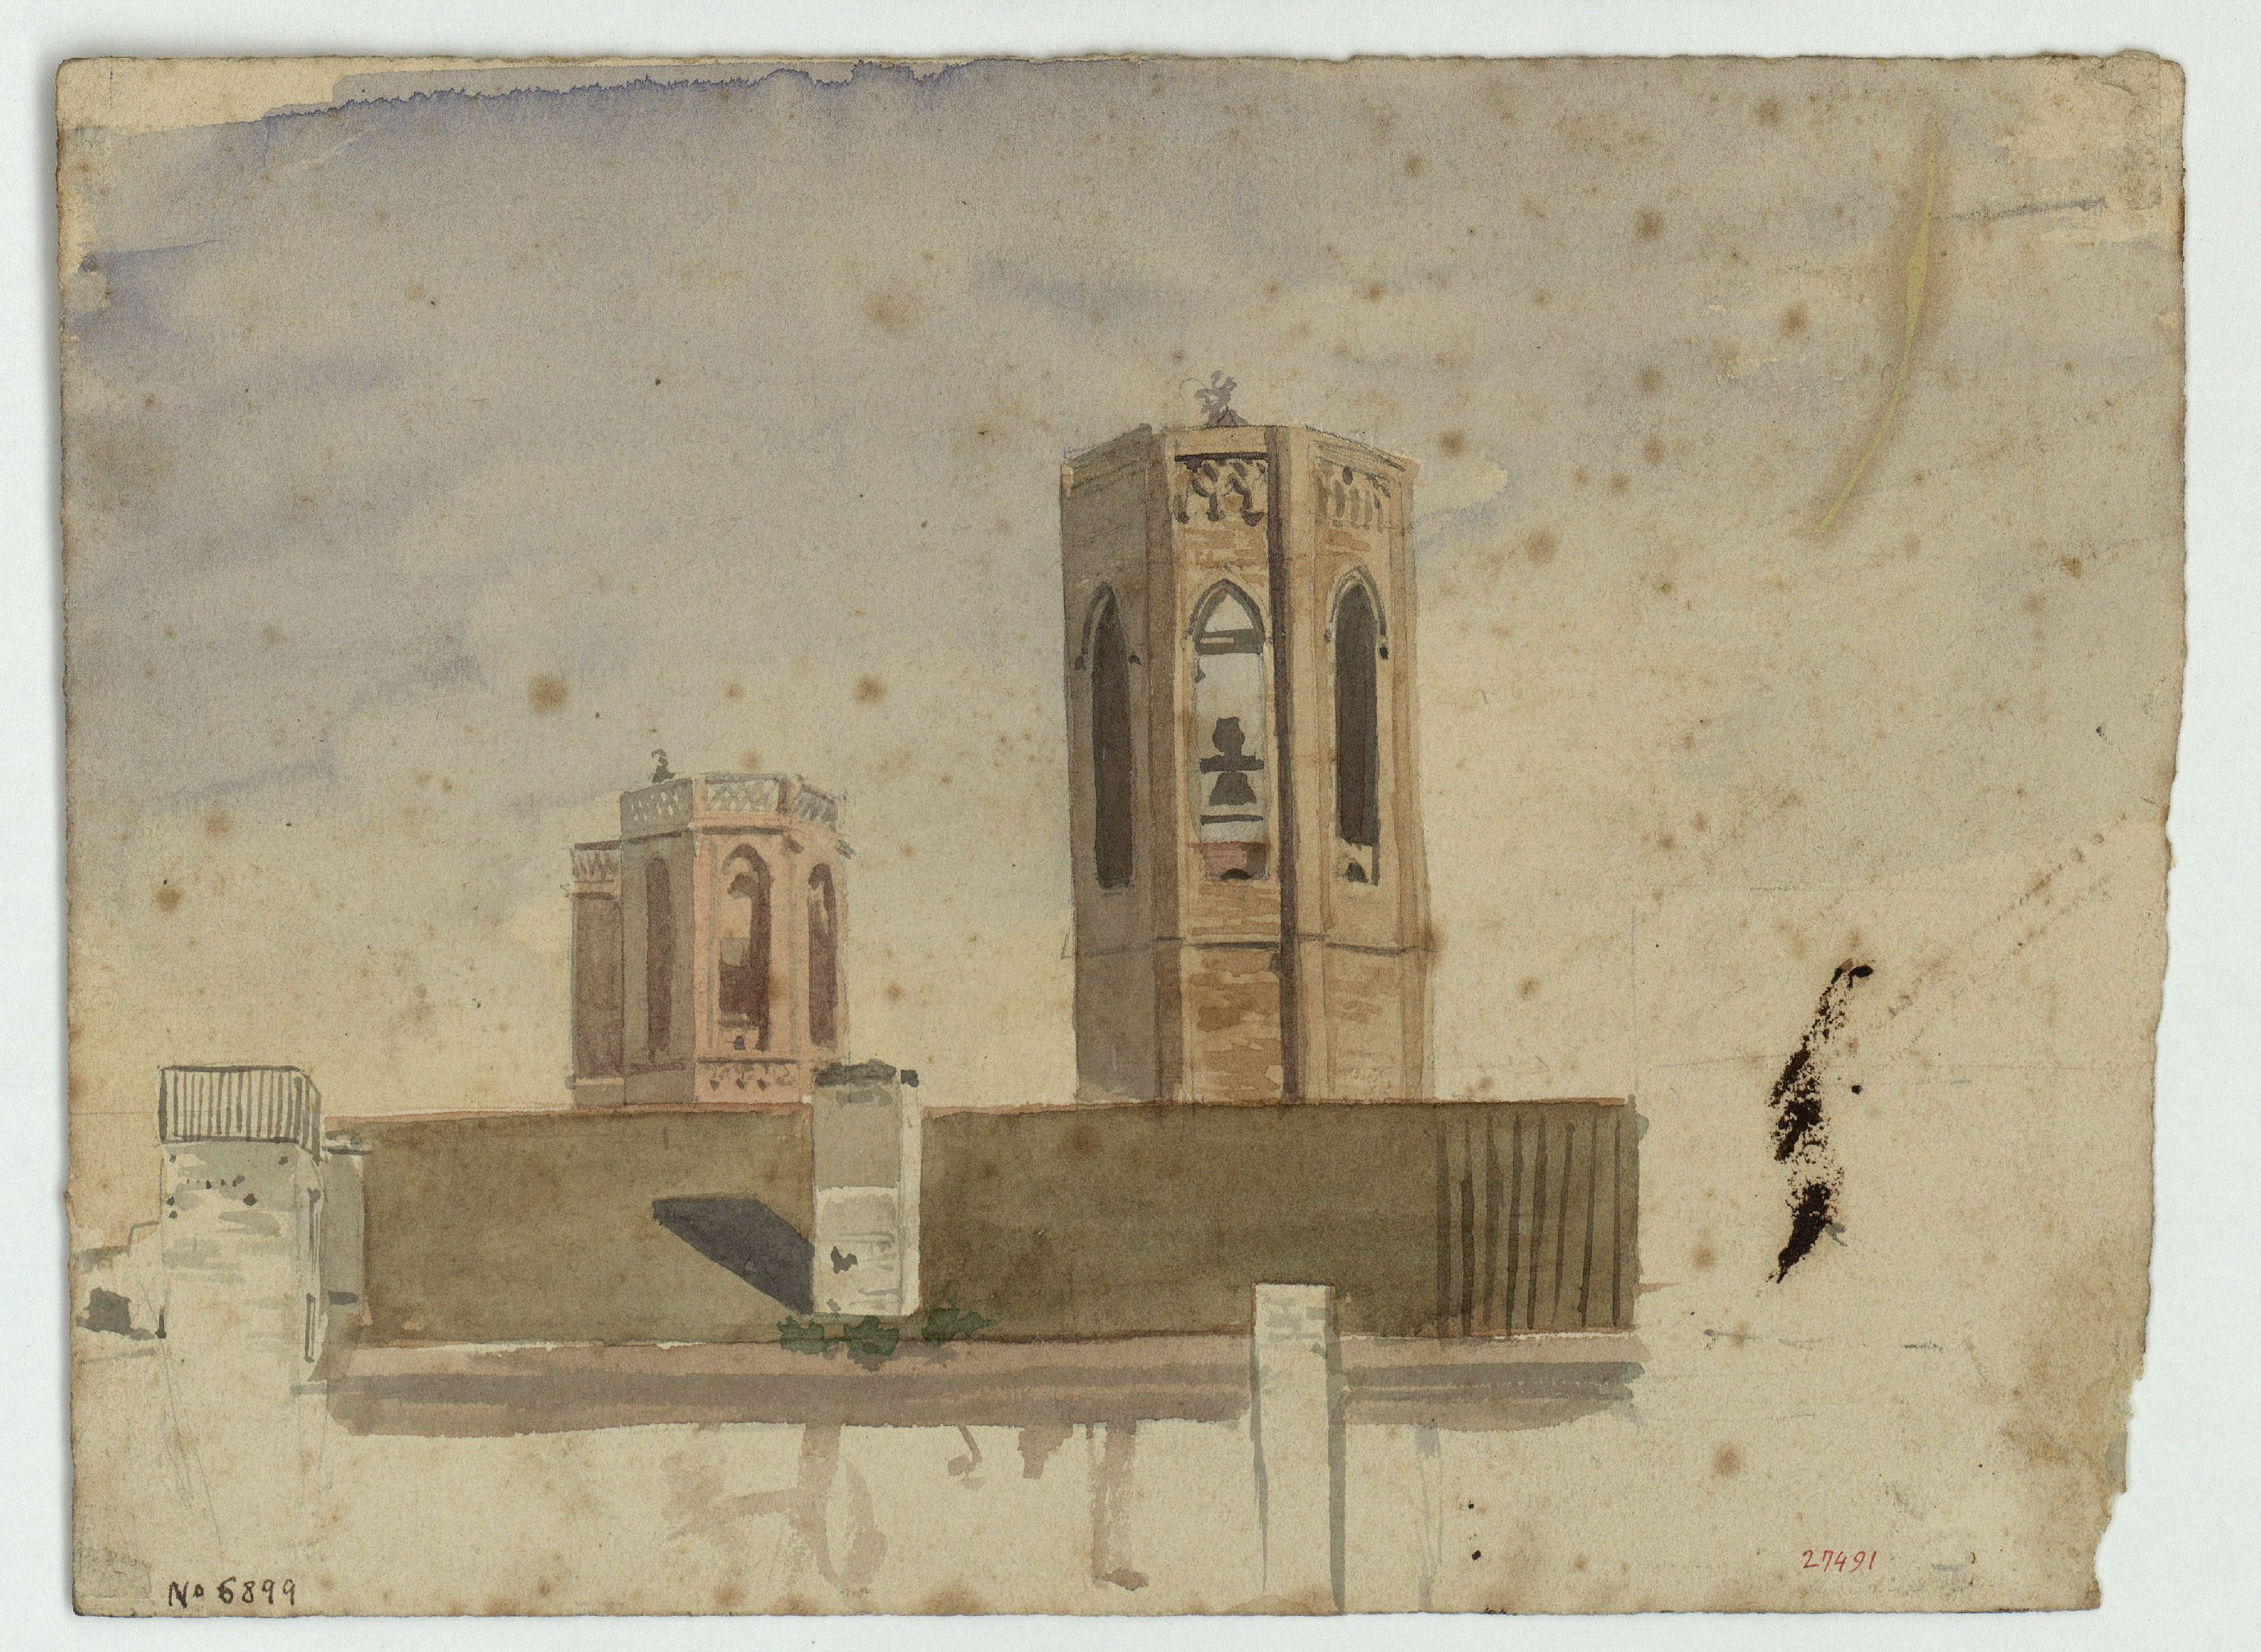 Marià Fortuny - Pedralbes - Circa 1856-1858